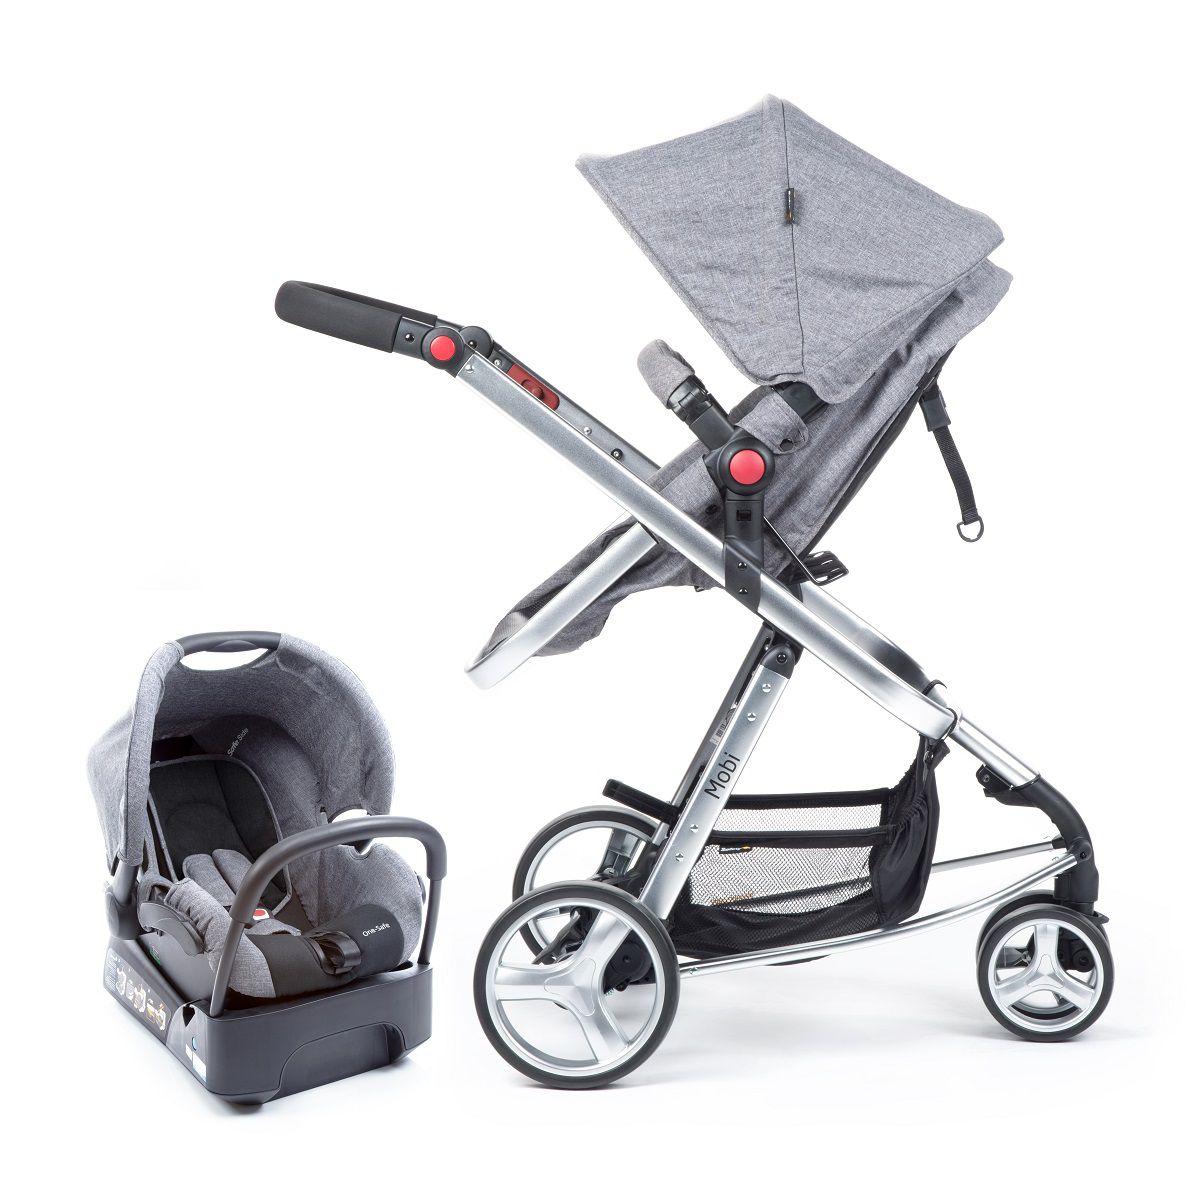 Carrinho de bebê Travel System Mobi denin cinza - Safety 1st